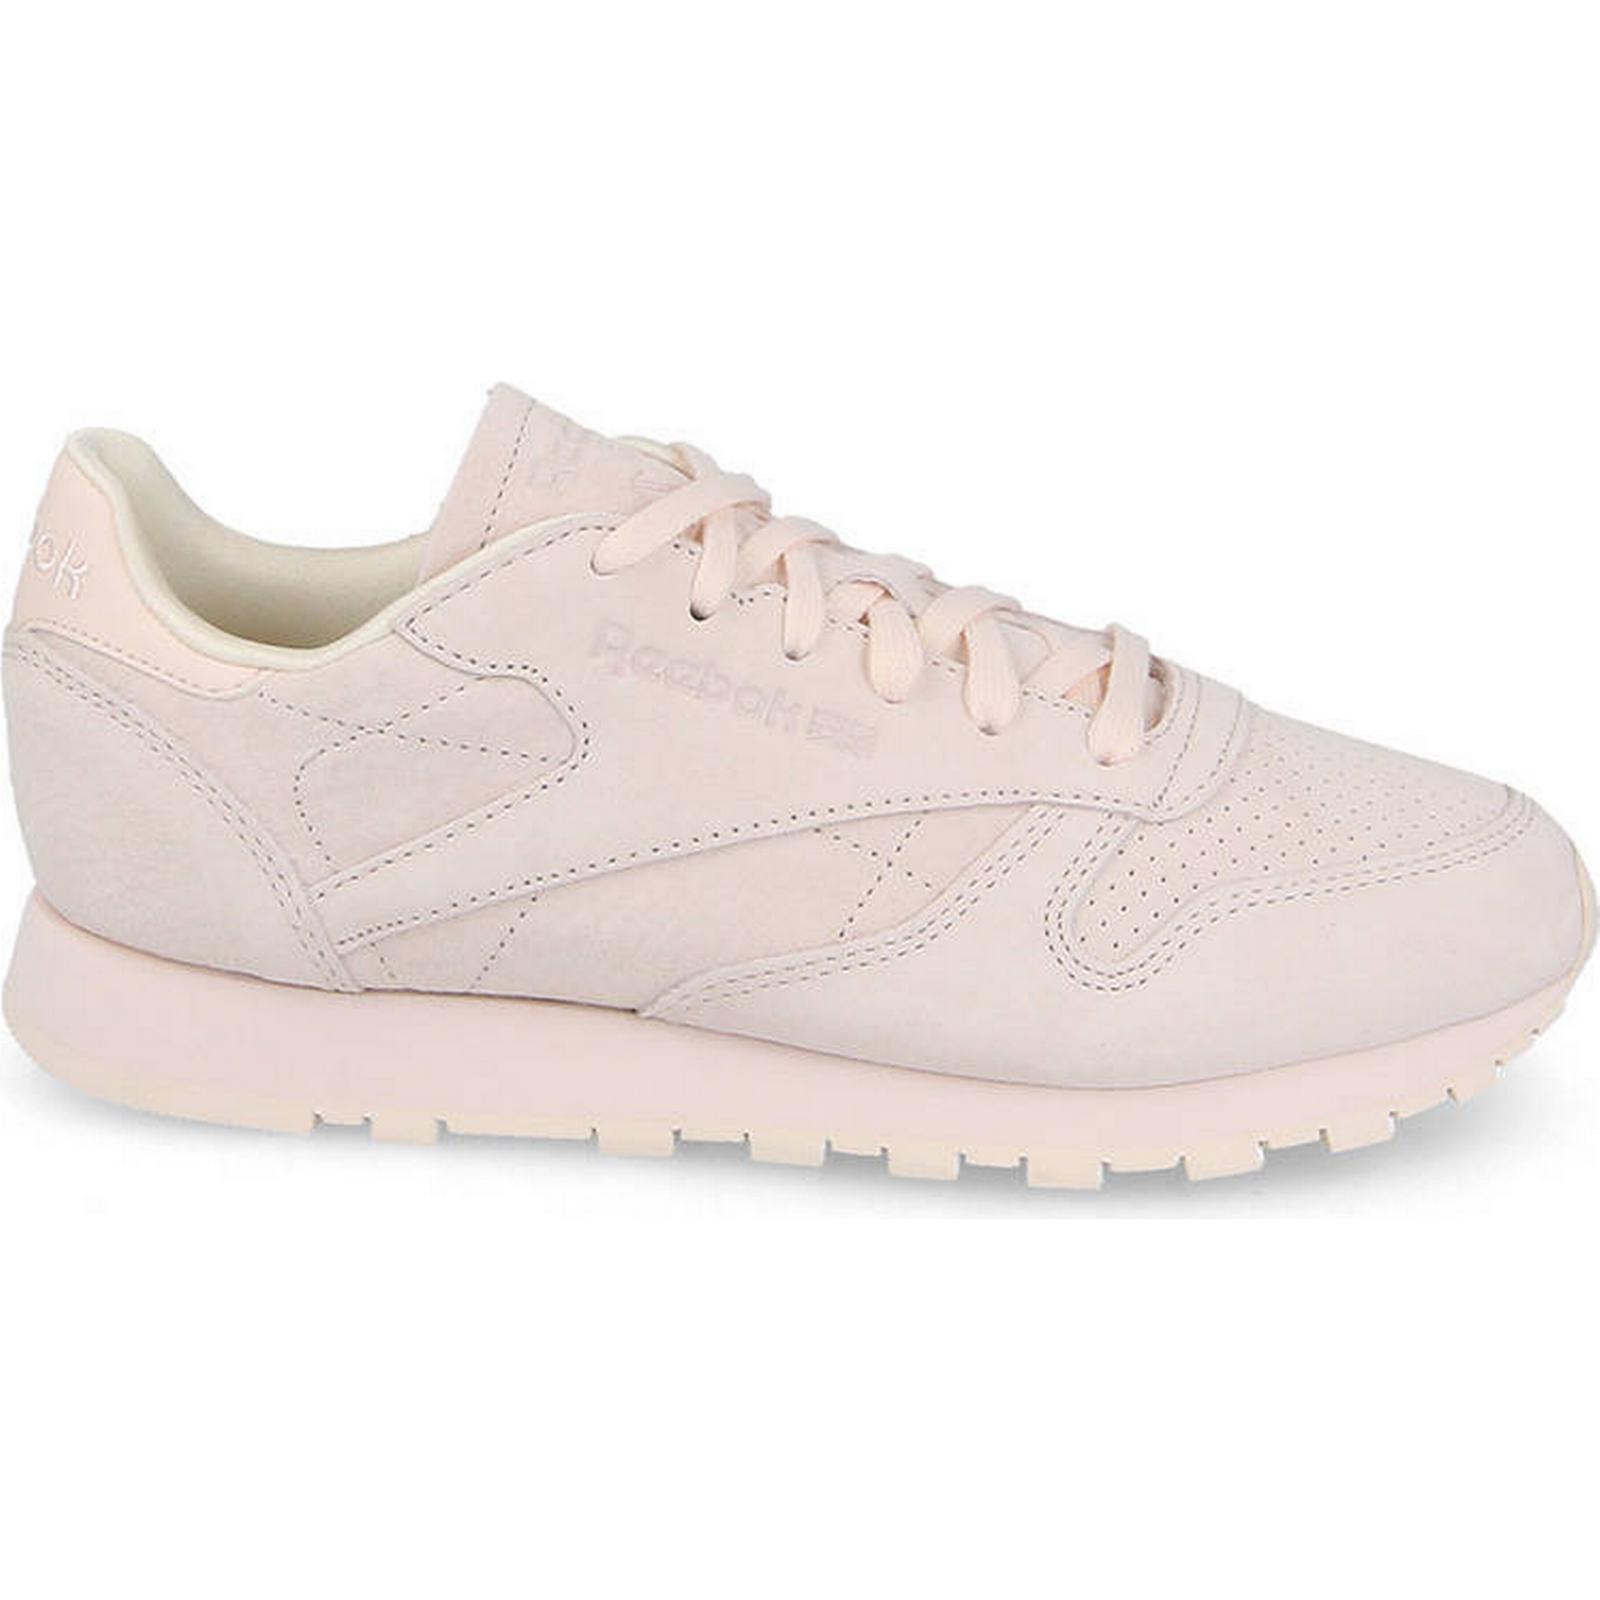 Reebok Classic Women's Shoes NBK sneakers Reebok Classic Leather NBK Shoes CM8766 PINK Size 37,5 5b2522